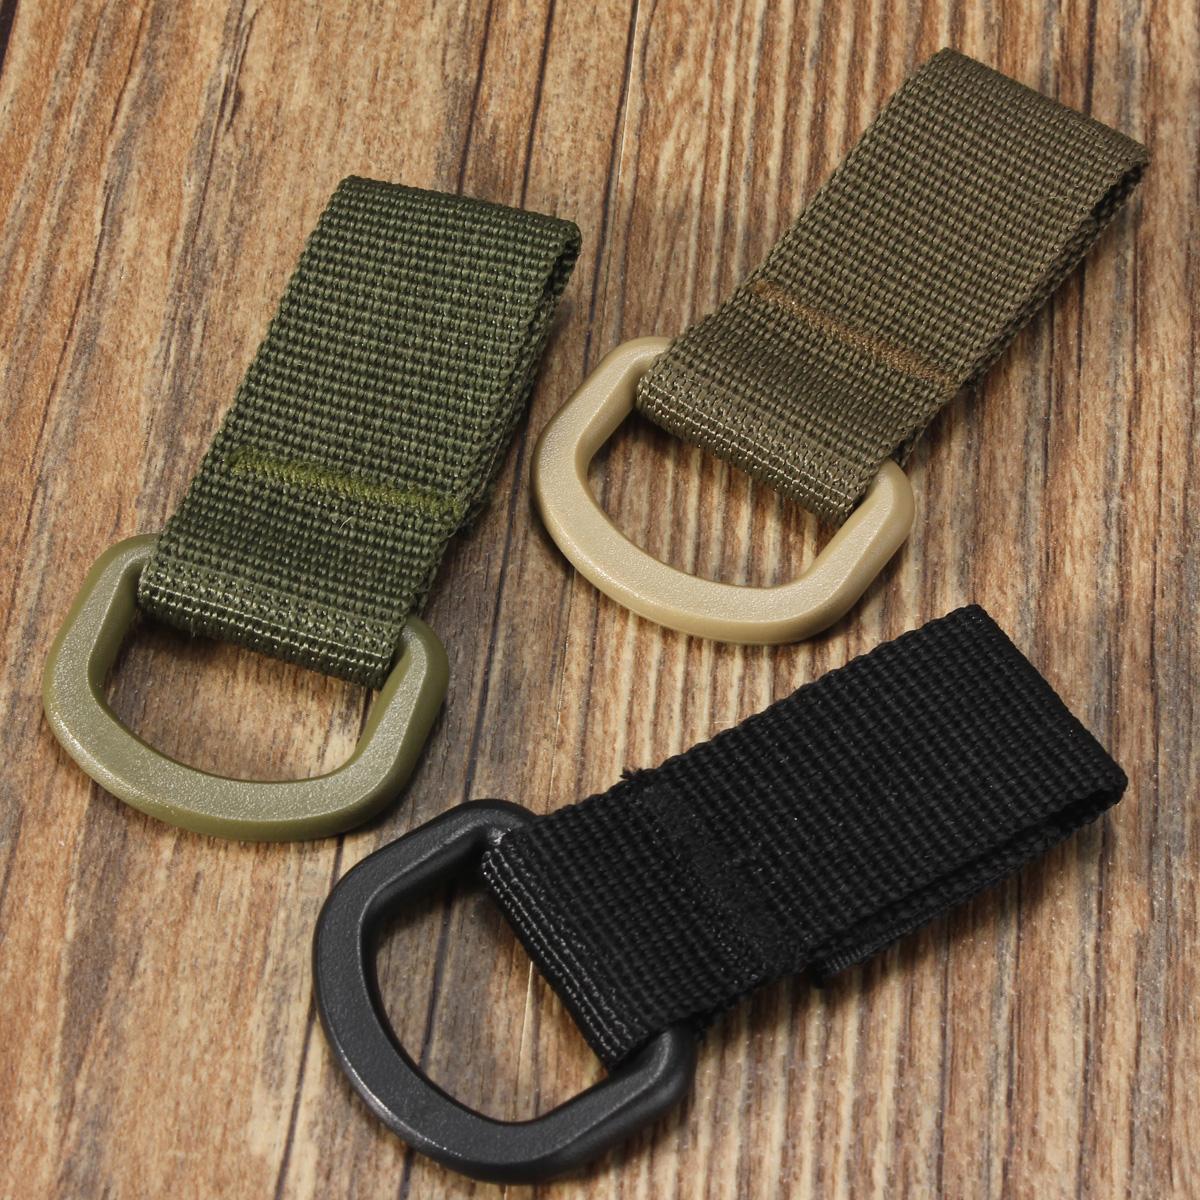 Military Tactical Carabiner Nylon Strap Buckle Hook Belt